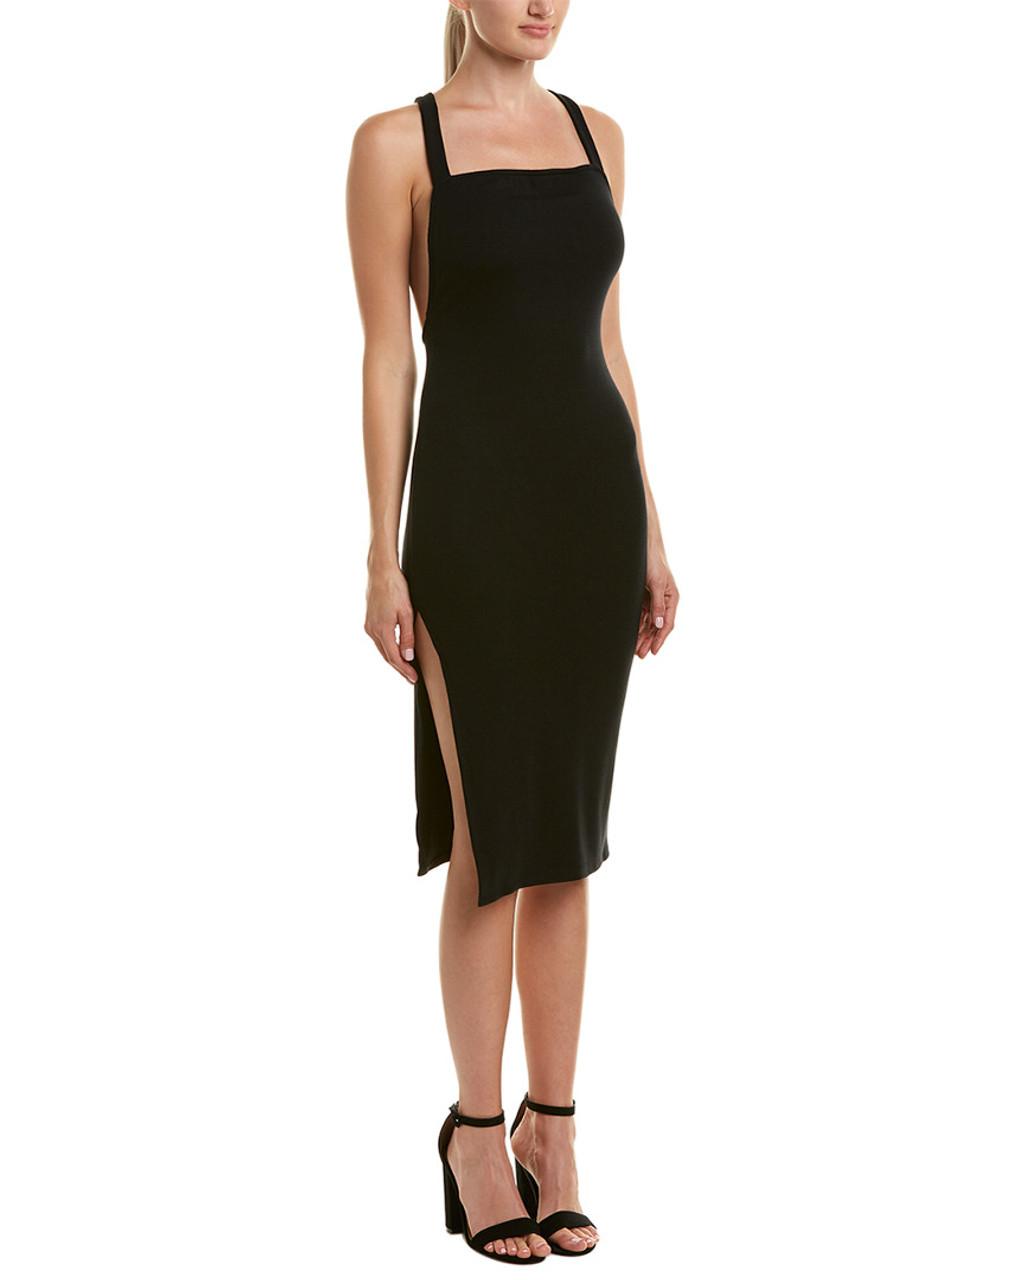 46773cef3ec Rachel Pally L.R. Strappy Midi Dress~1411781096 - Boston Store